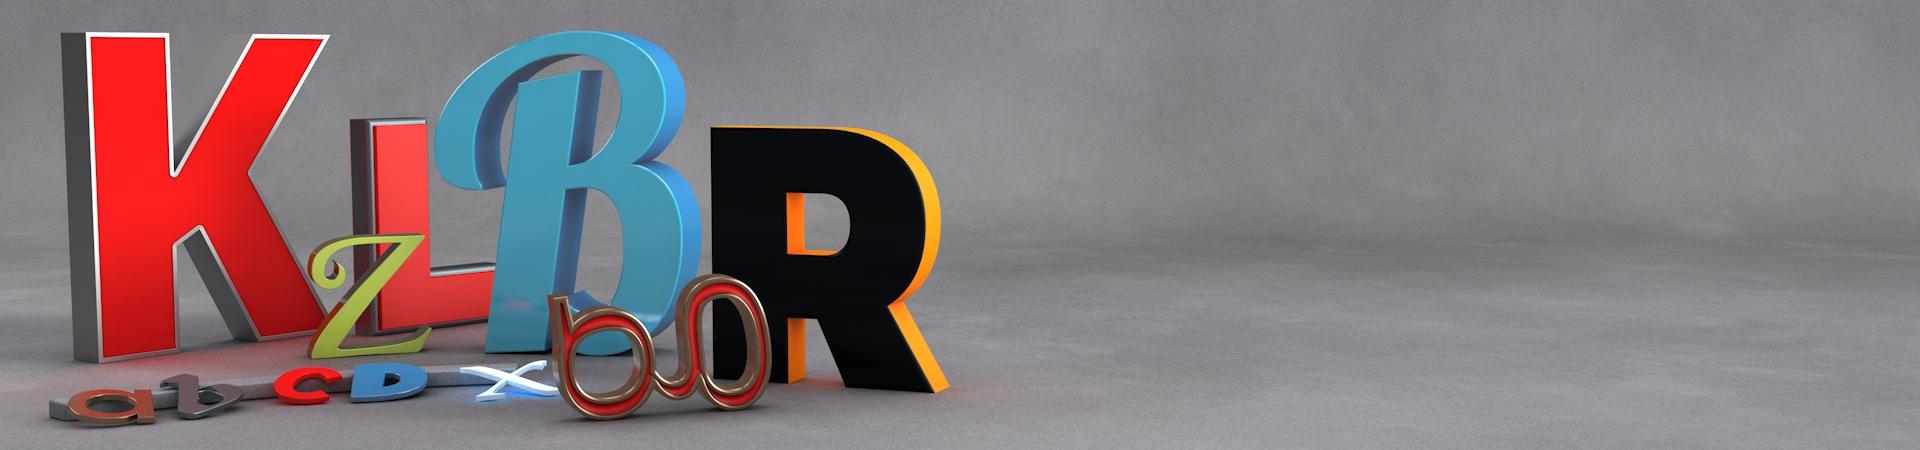 Konstrukta Leuchtbuchstaben